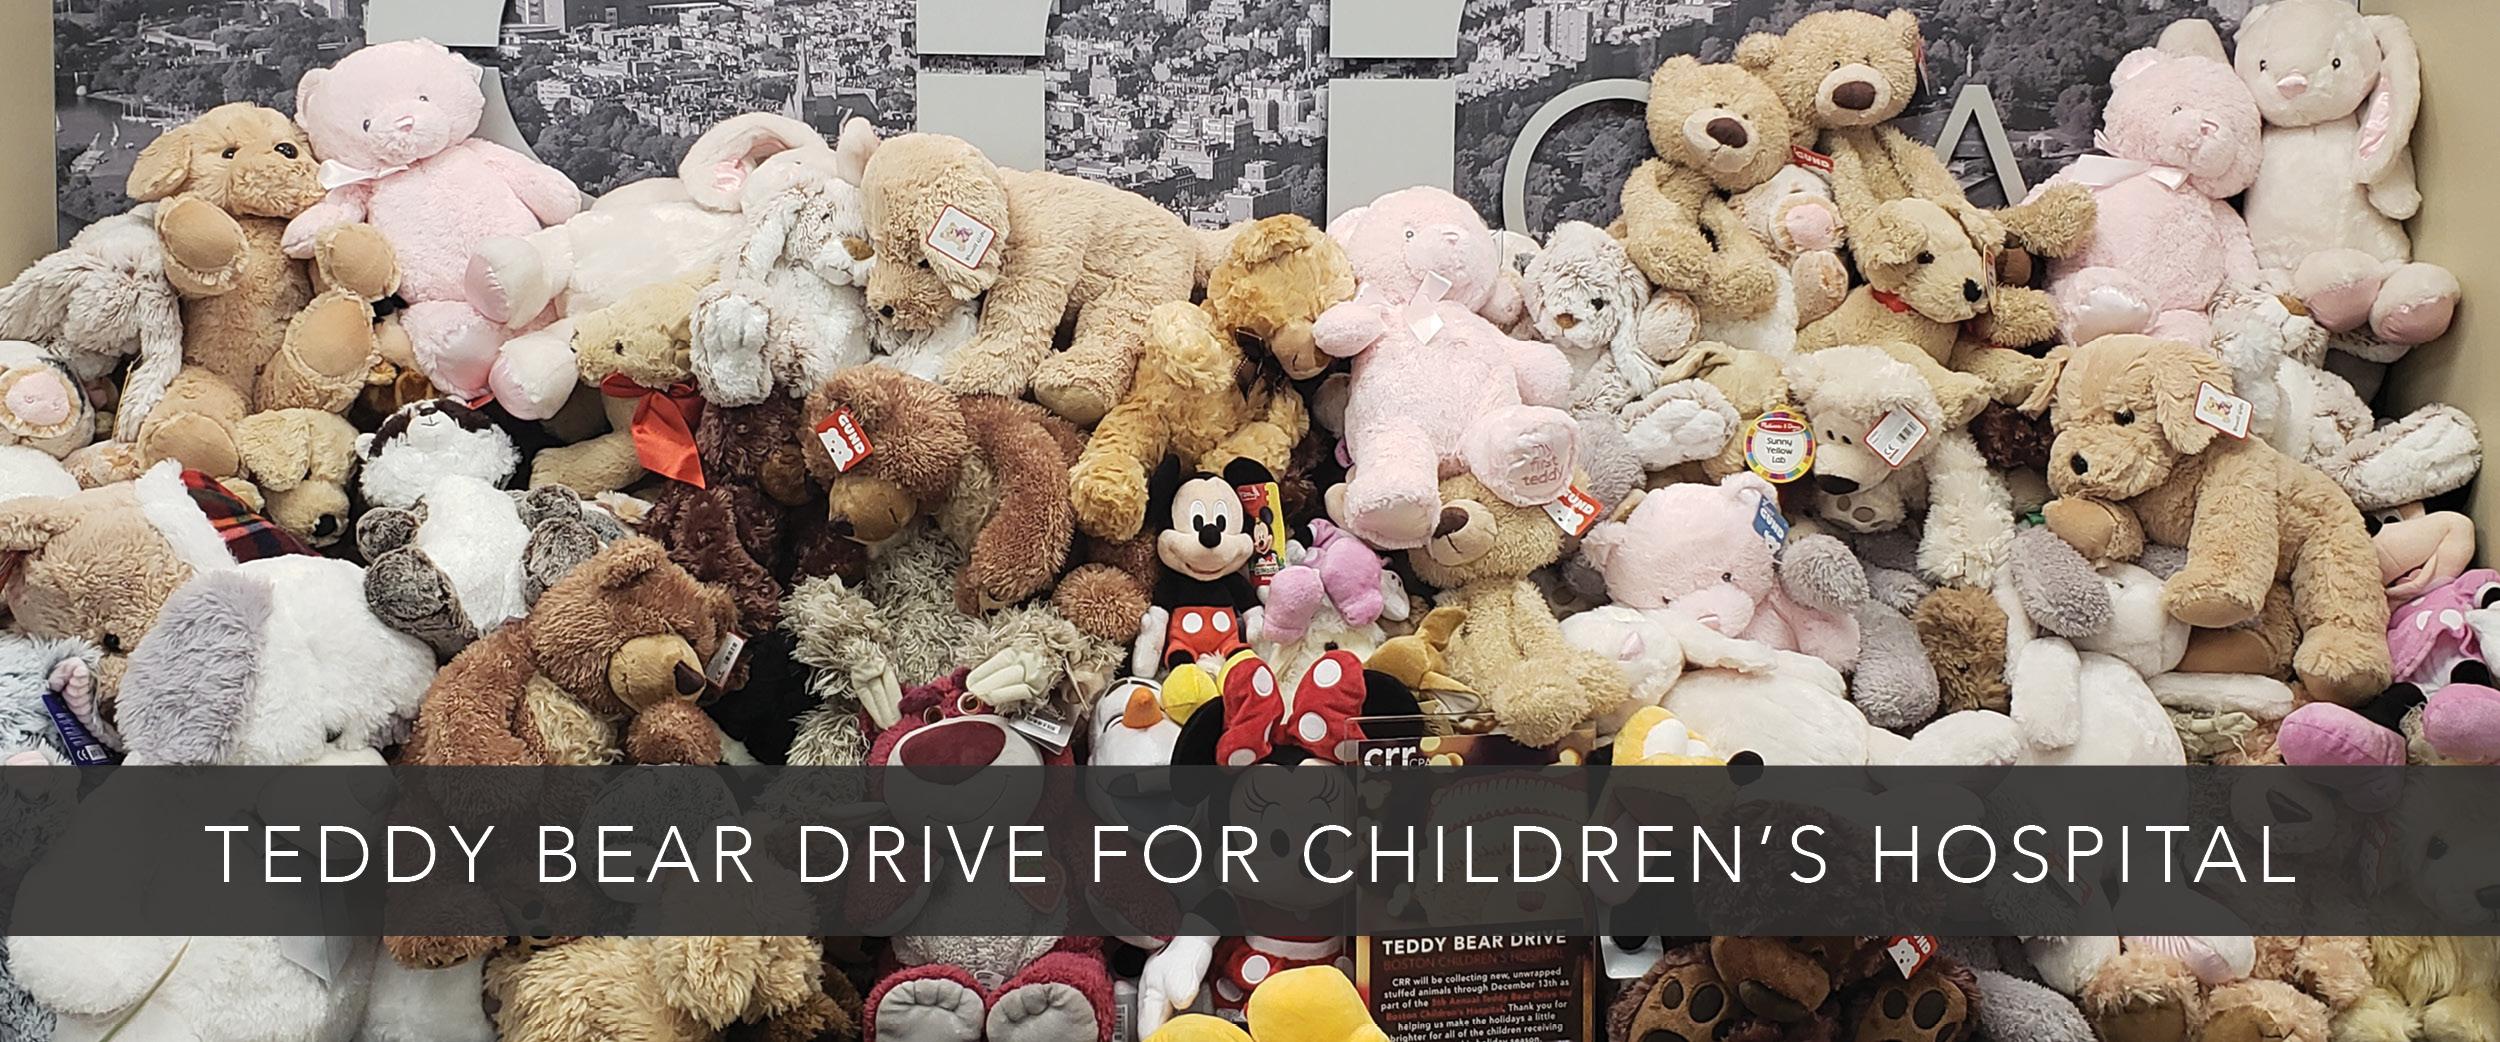 slider-2018-teddy-bear-drive